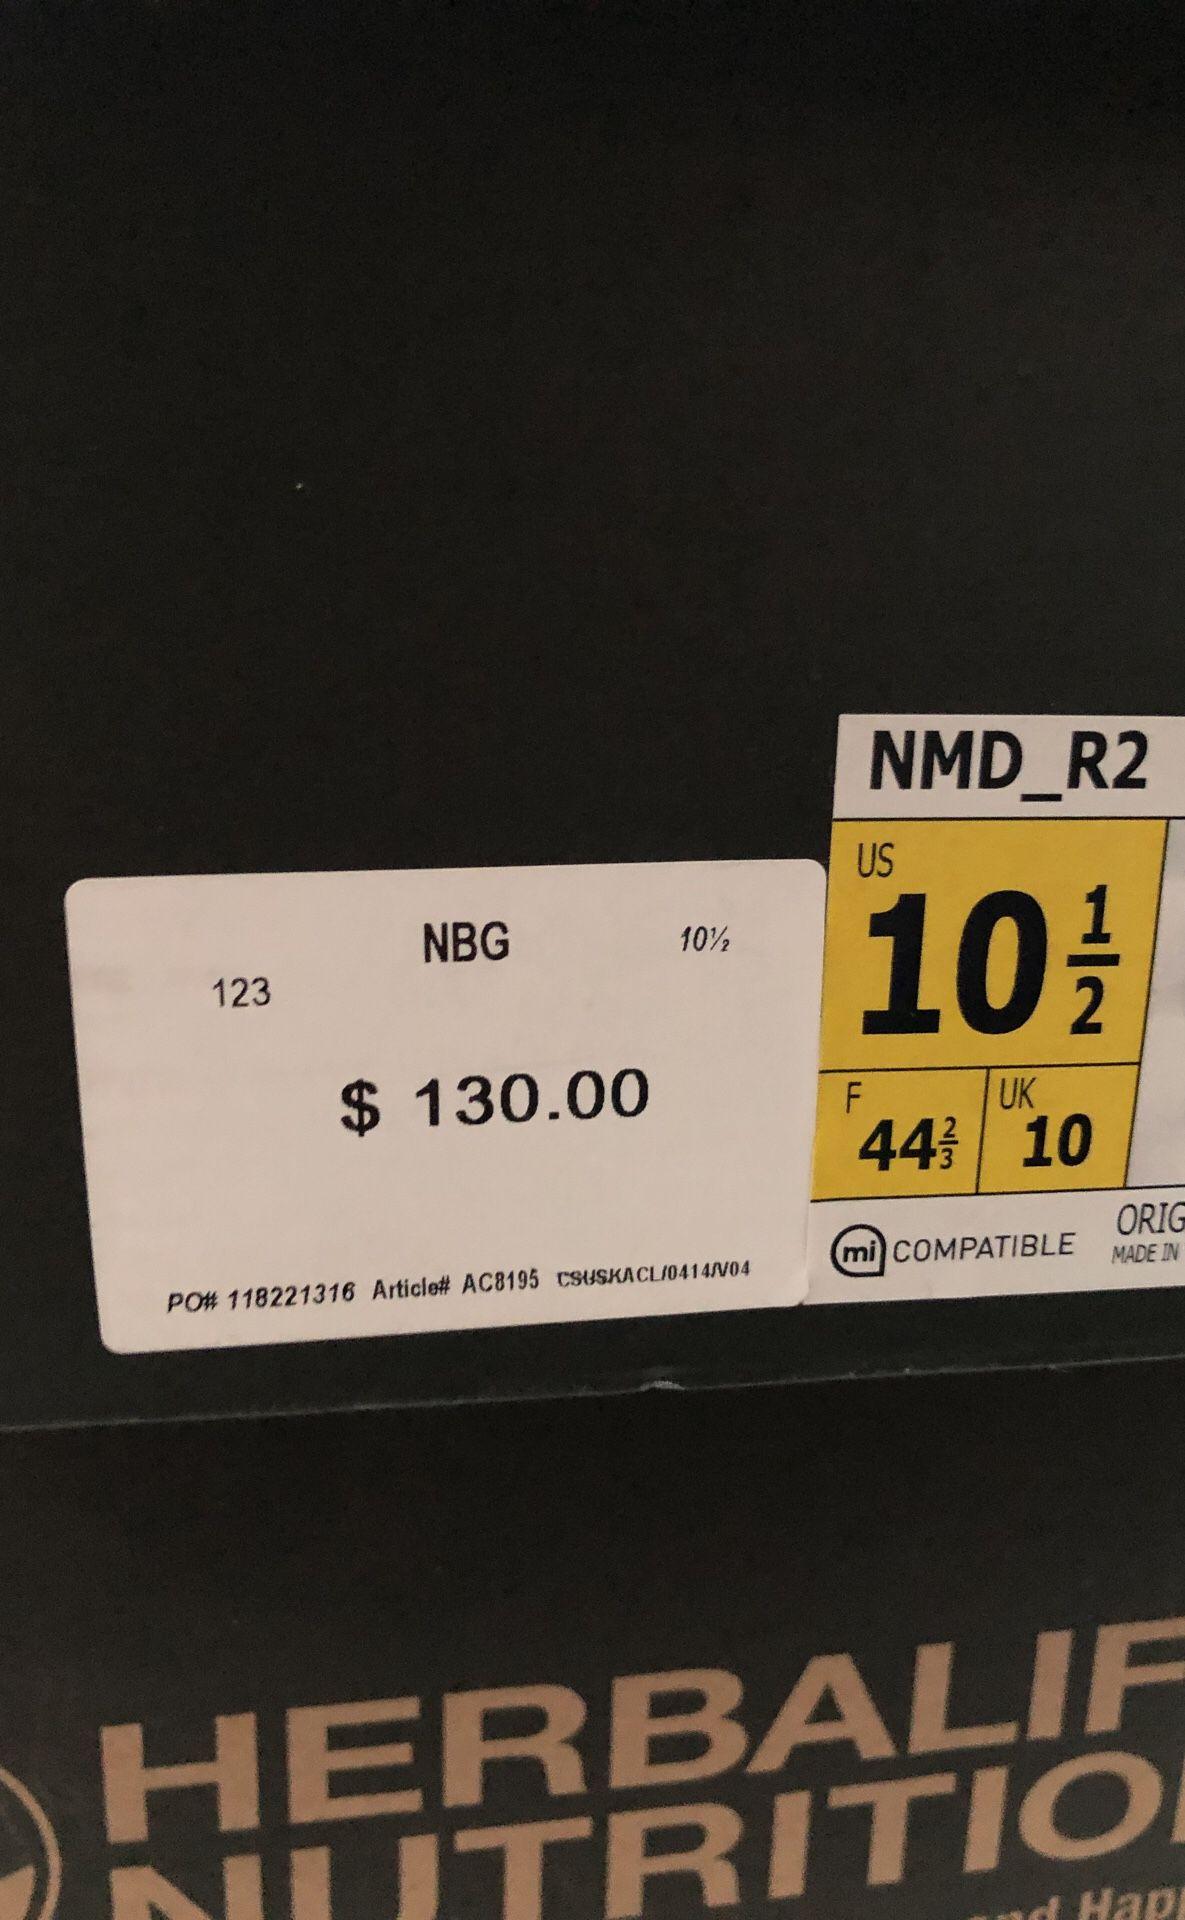 NMD R2 grey/orange